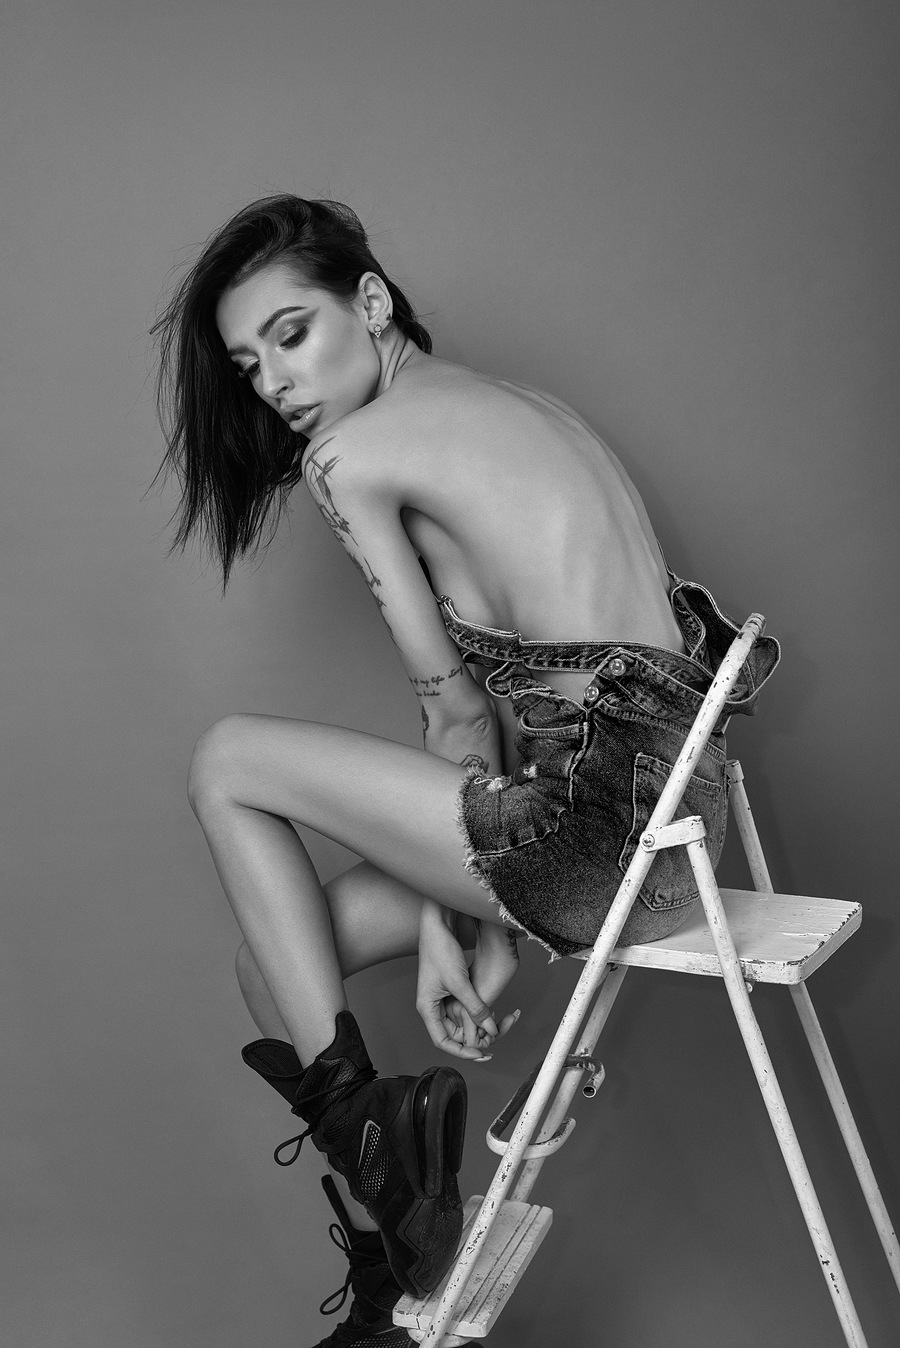 Model Delfina Def / Uploaded 28th January 2020 @ 12:38 PM